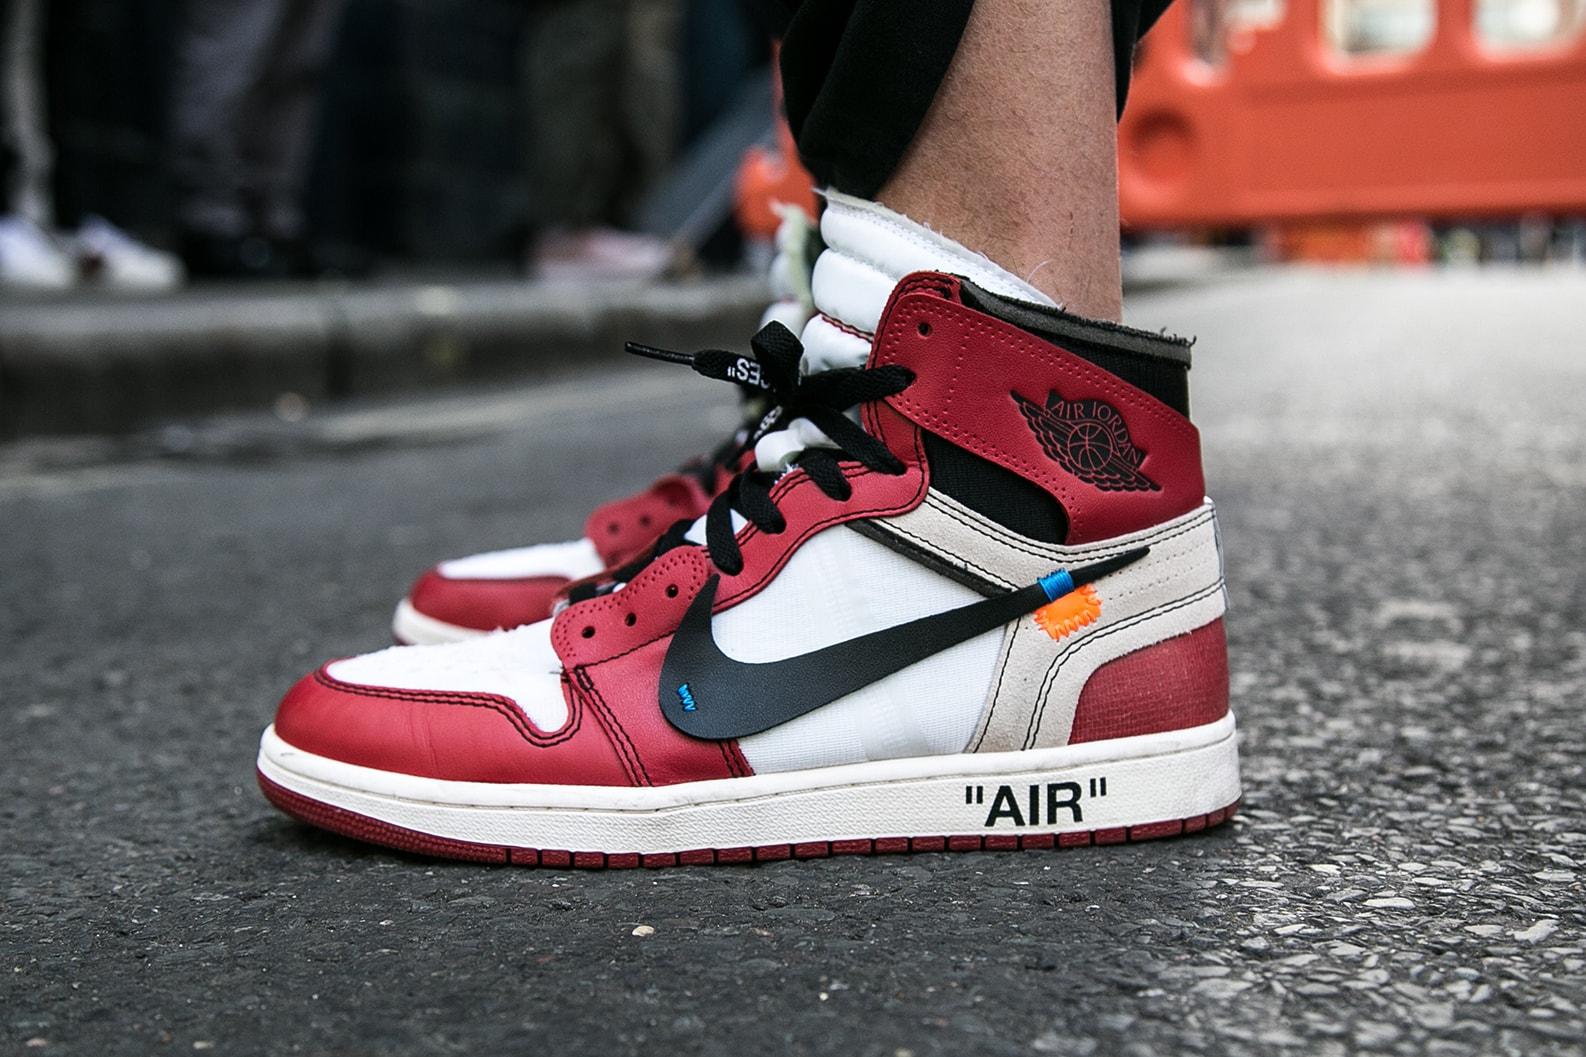 Off-White Nike THE TEN SNKRS App Virgil Abloh Yeezy adidas Bots Supreme